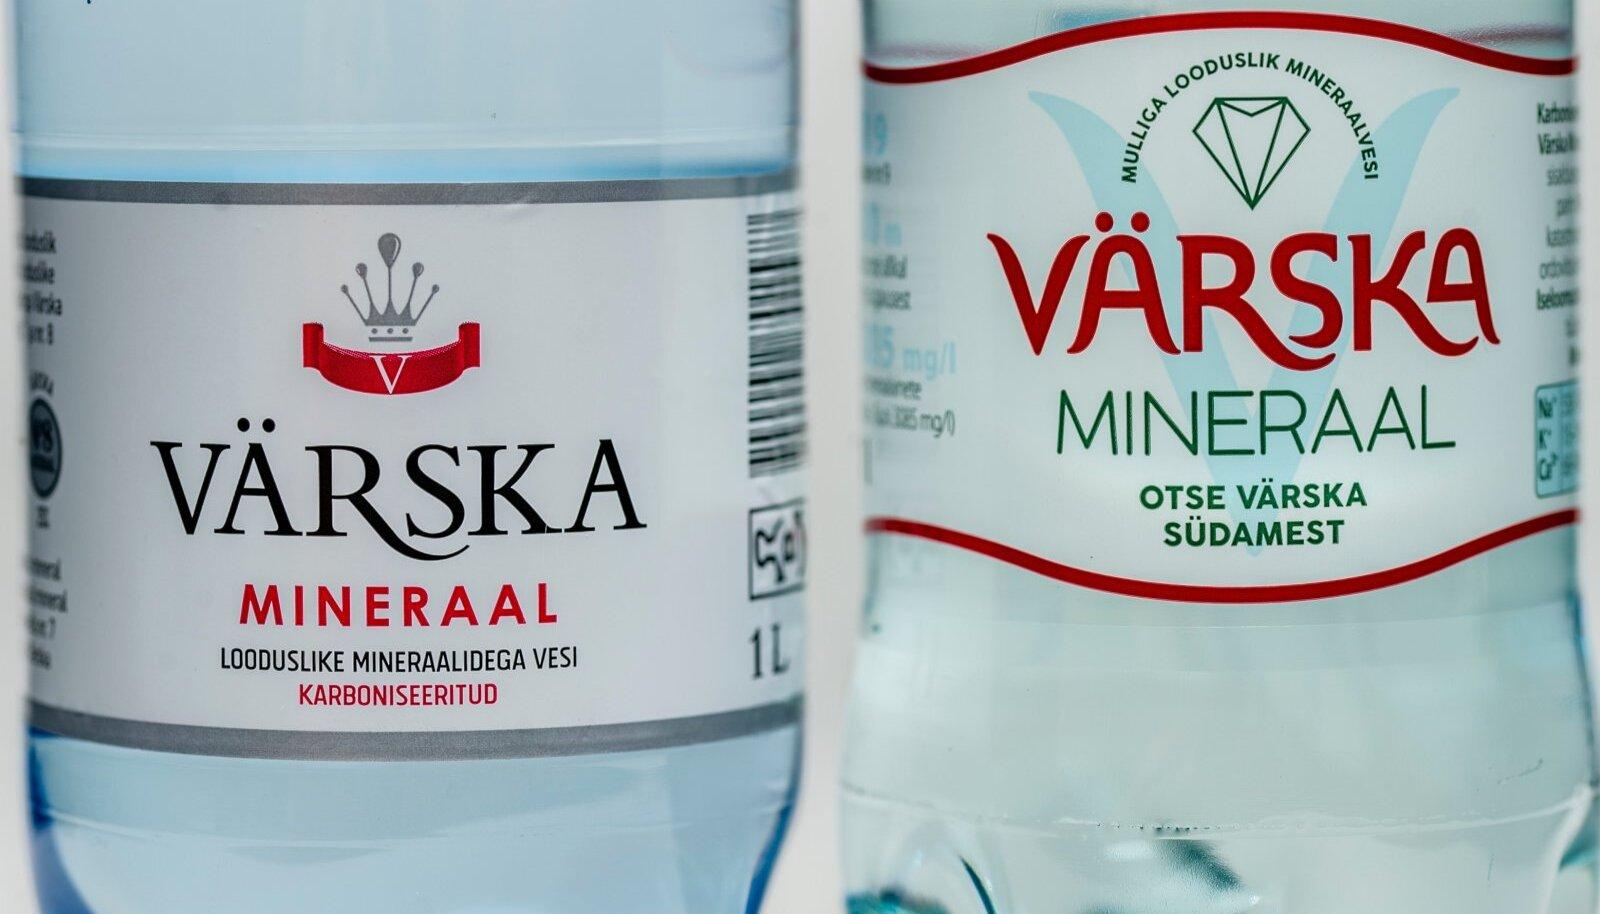 NAGU KAKS TILKA VETT: Värska mineraal ja Värska mineraal.